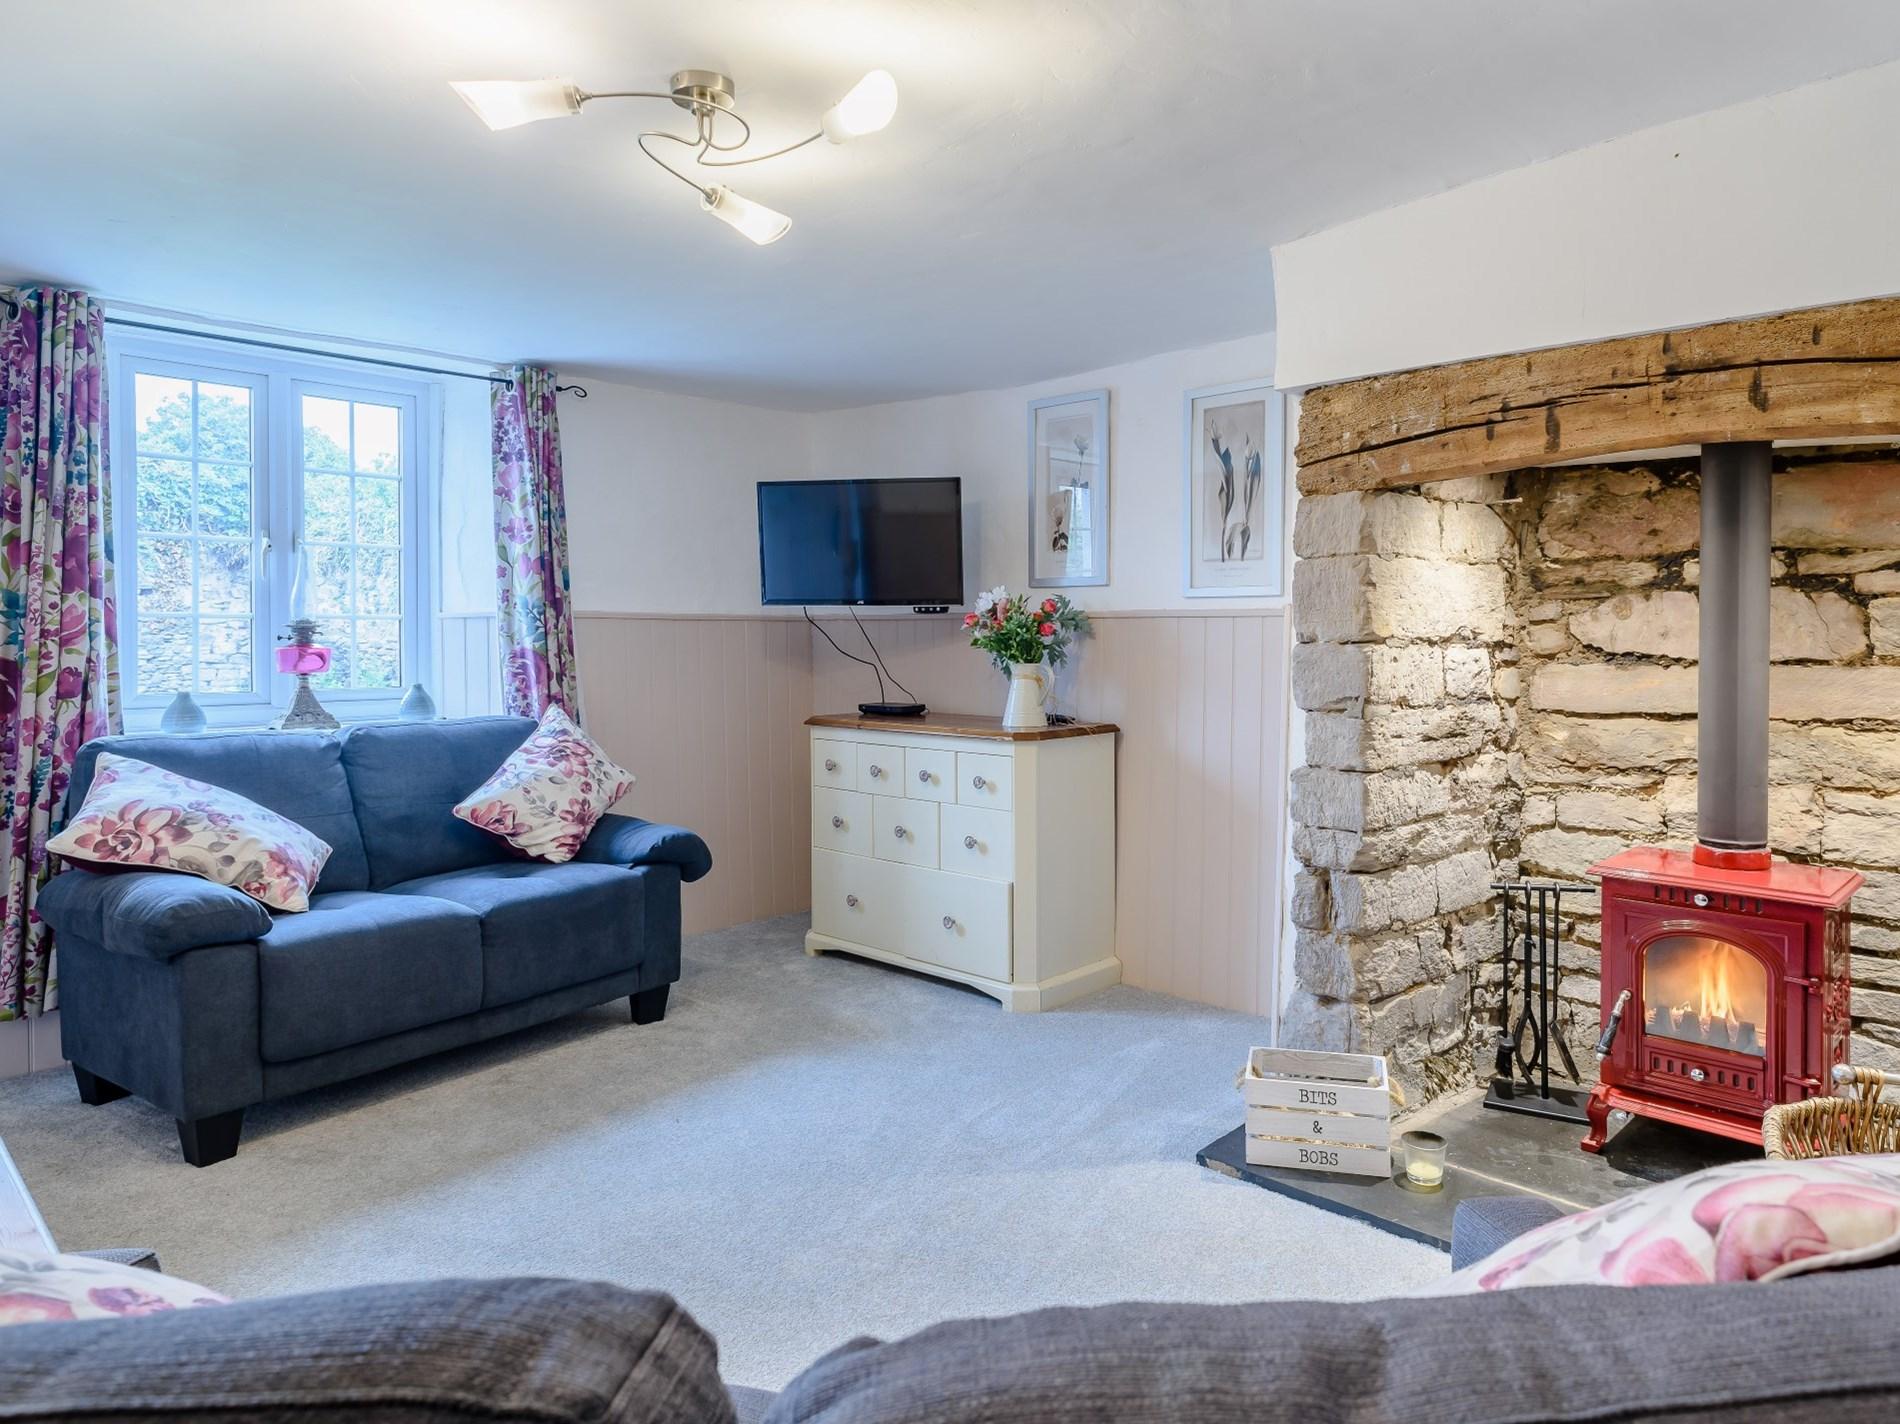 2 Bedroom Cottage in South Molton, Devon